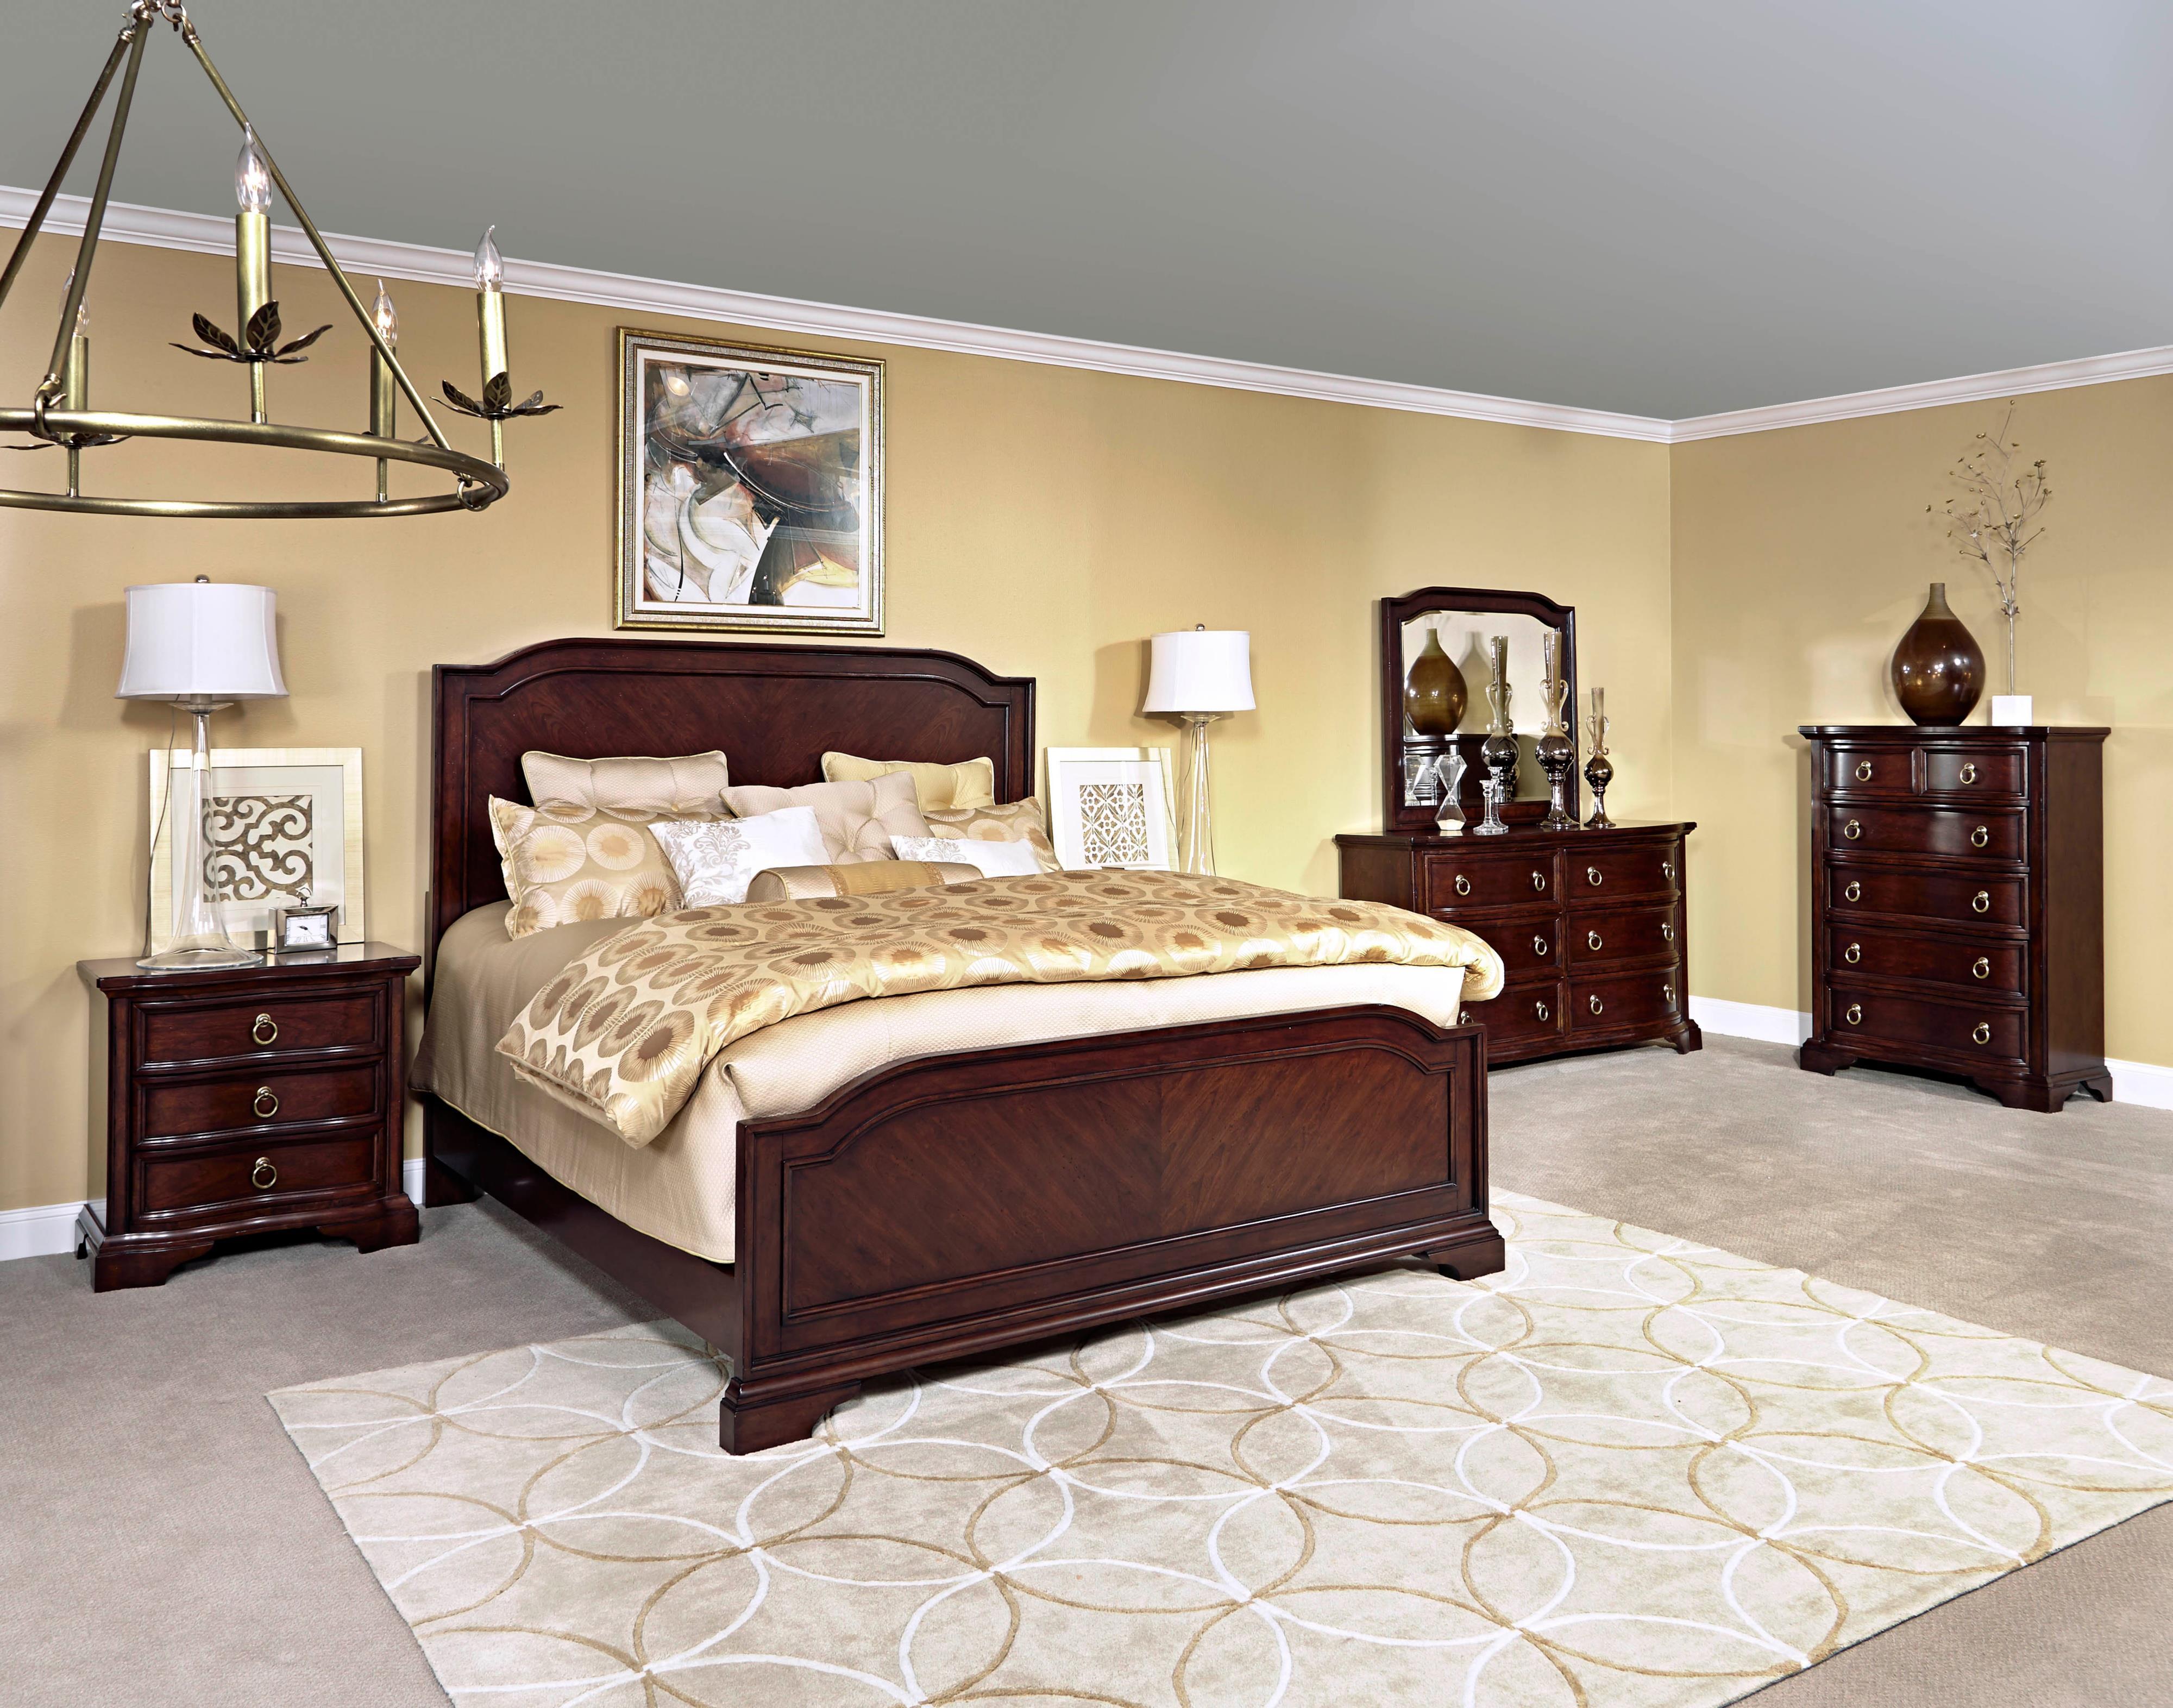 Broyhill Furniture Elaina King Bedroom Group Lindy s